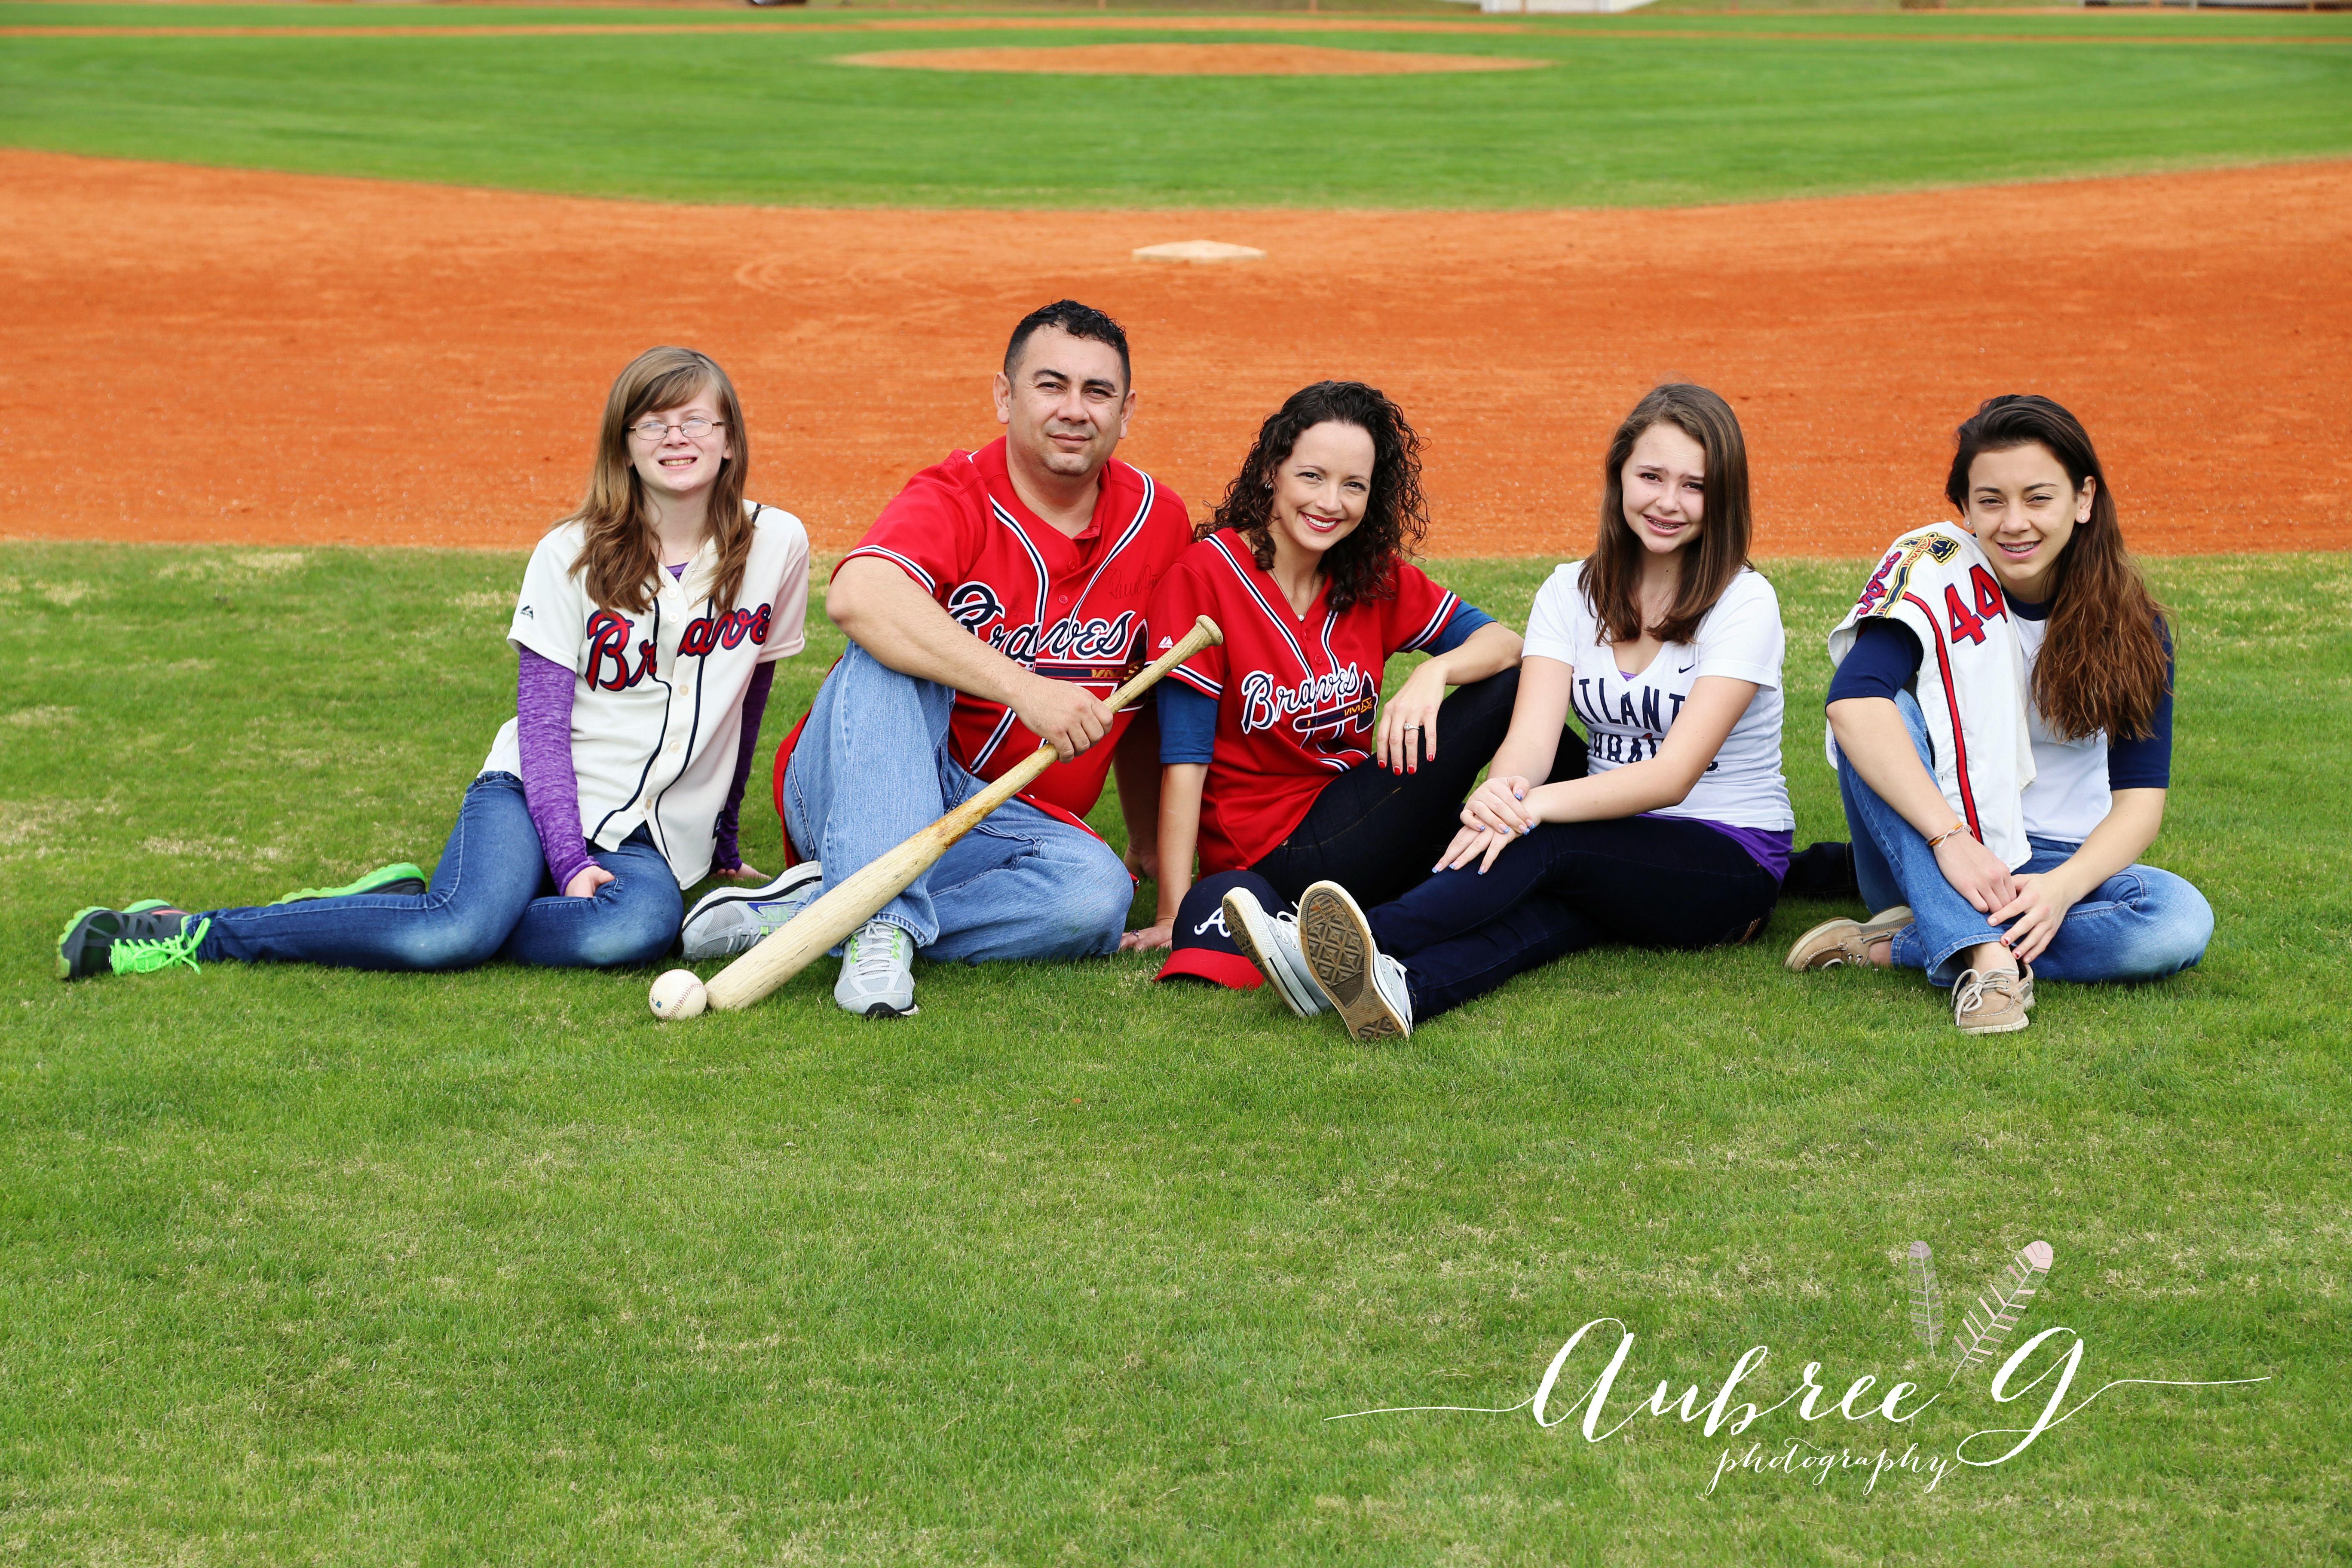 Family Baseball Aubreegphotography Com Baseball Family Baseball Pictures Family Christmas Pictures